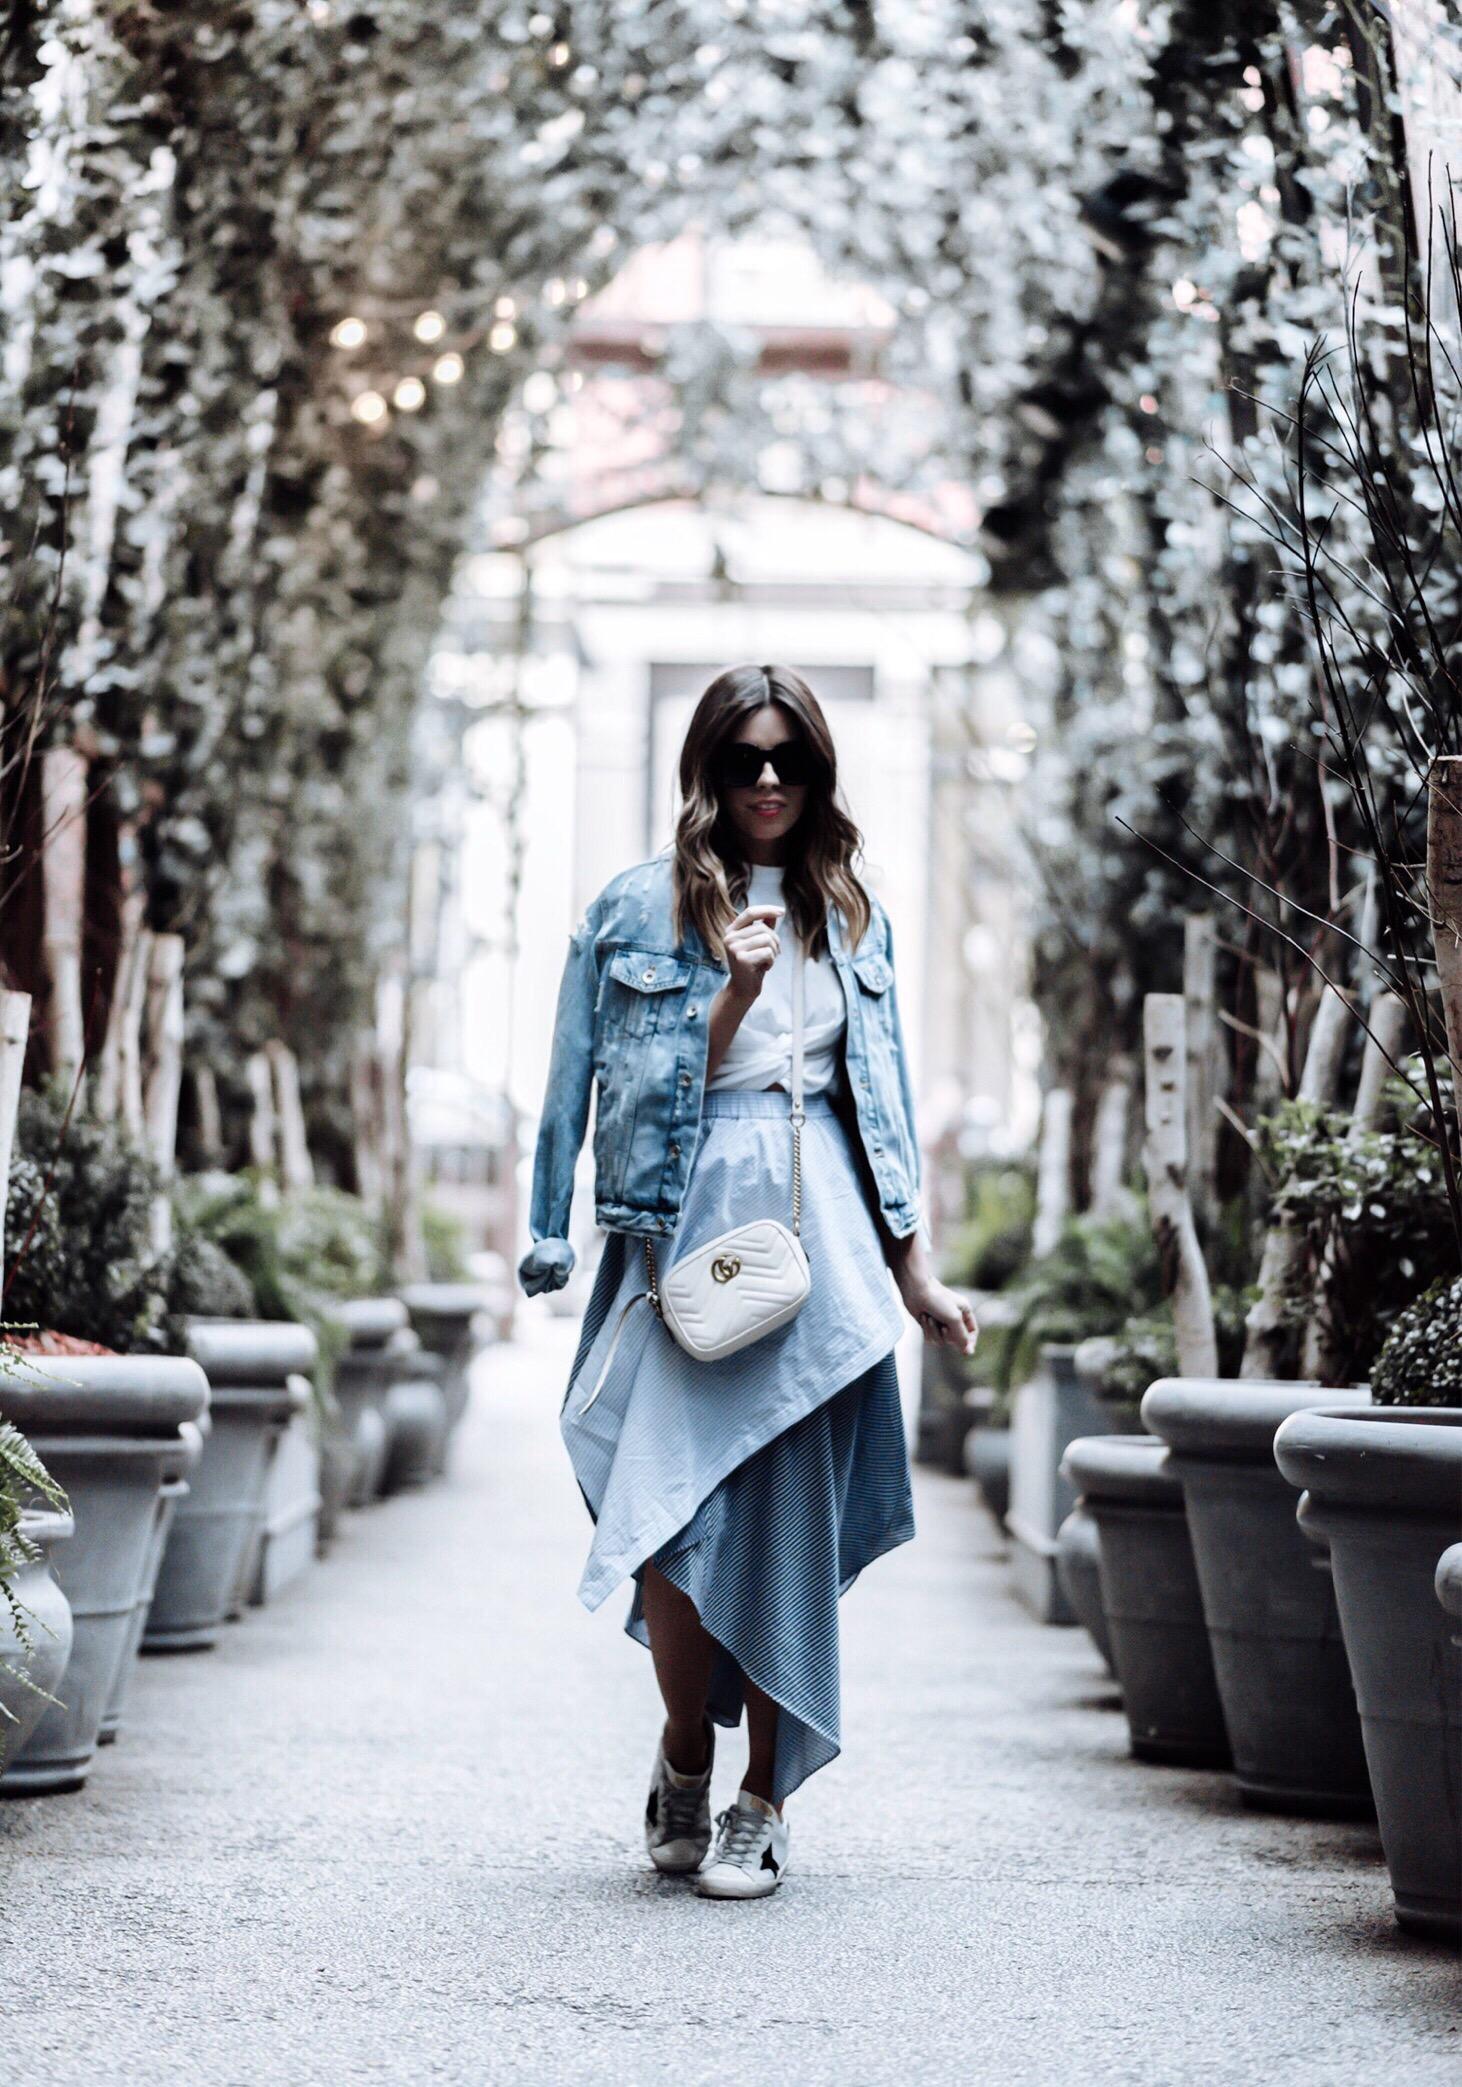 Tiffany Jais fashion and lifestyle blogger of Flaunt and Center | NYFW | NOMO SOHO NYC | Opening Ceremony skirt, Gucci marmot bag in white